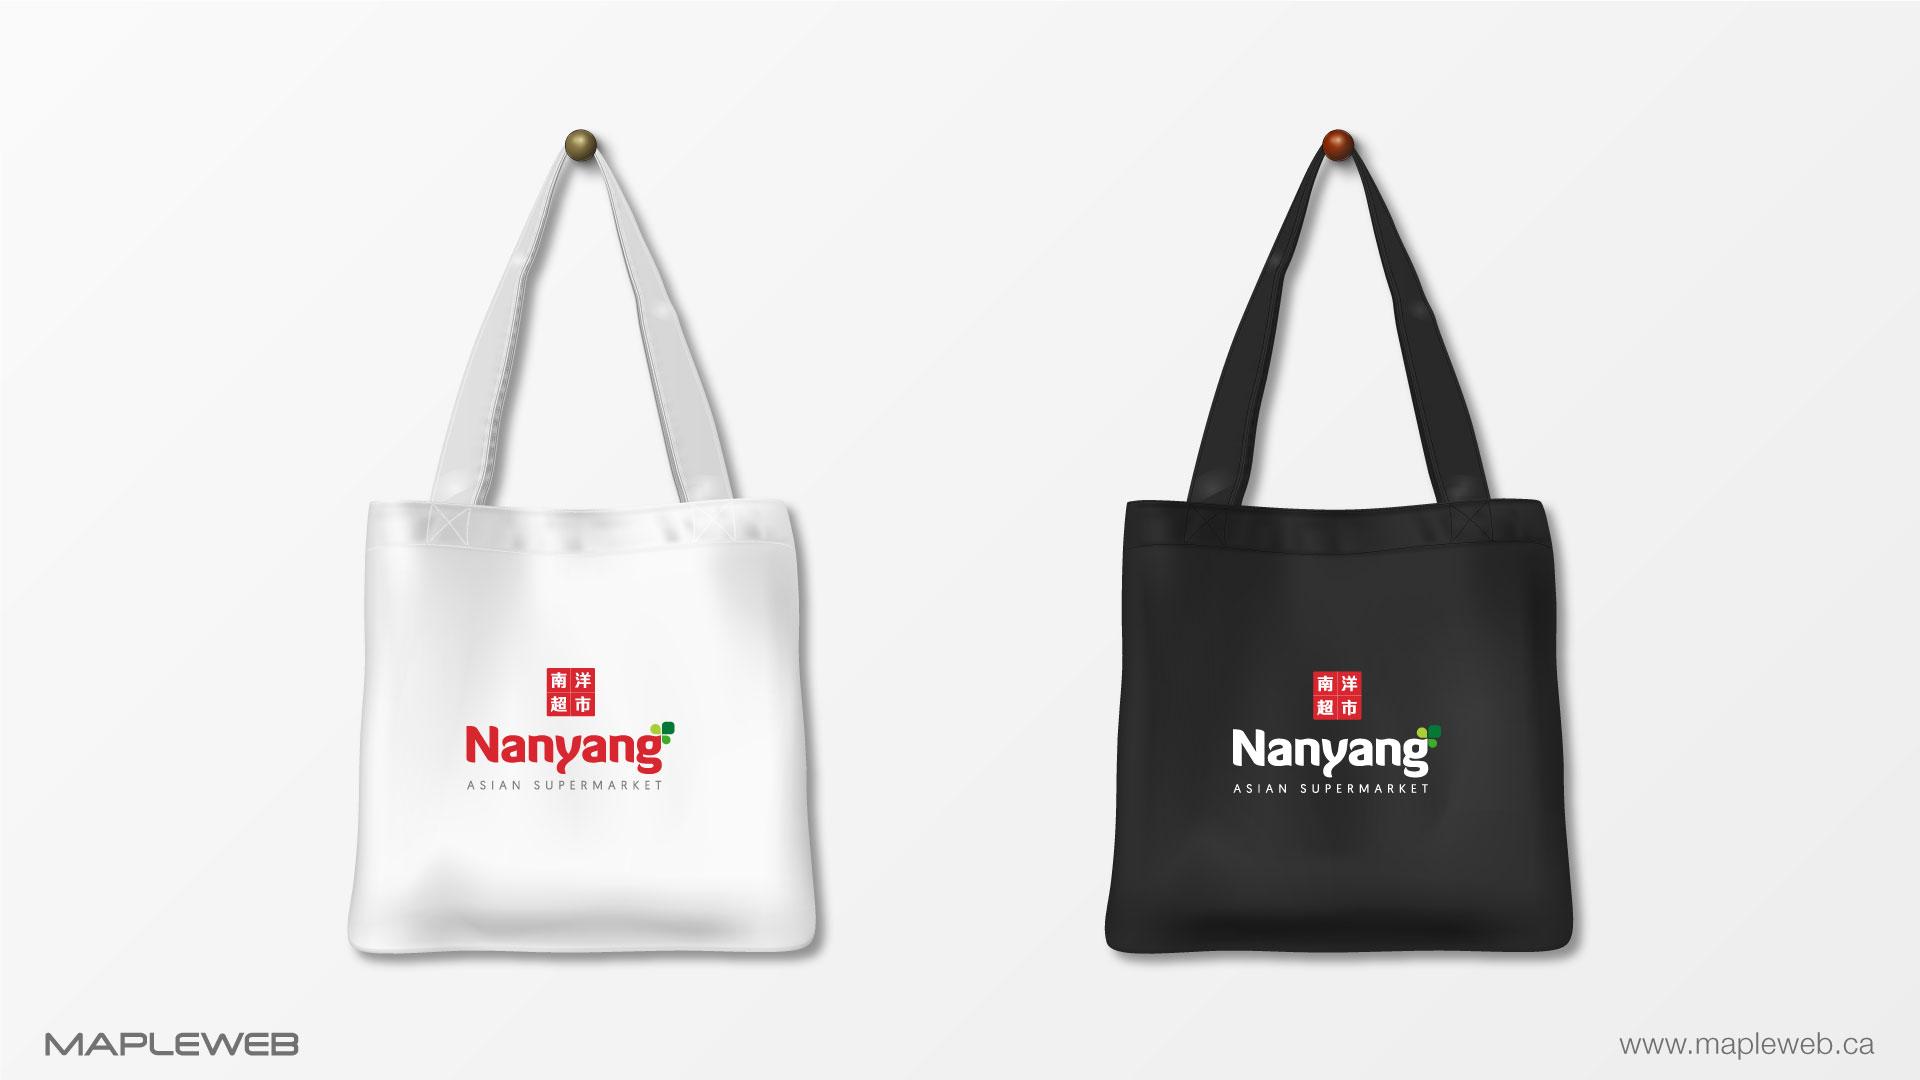 nanyang-brand-logo-design-by-mapleweb-vancouver-canada-white-and-black-bag-mock